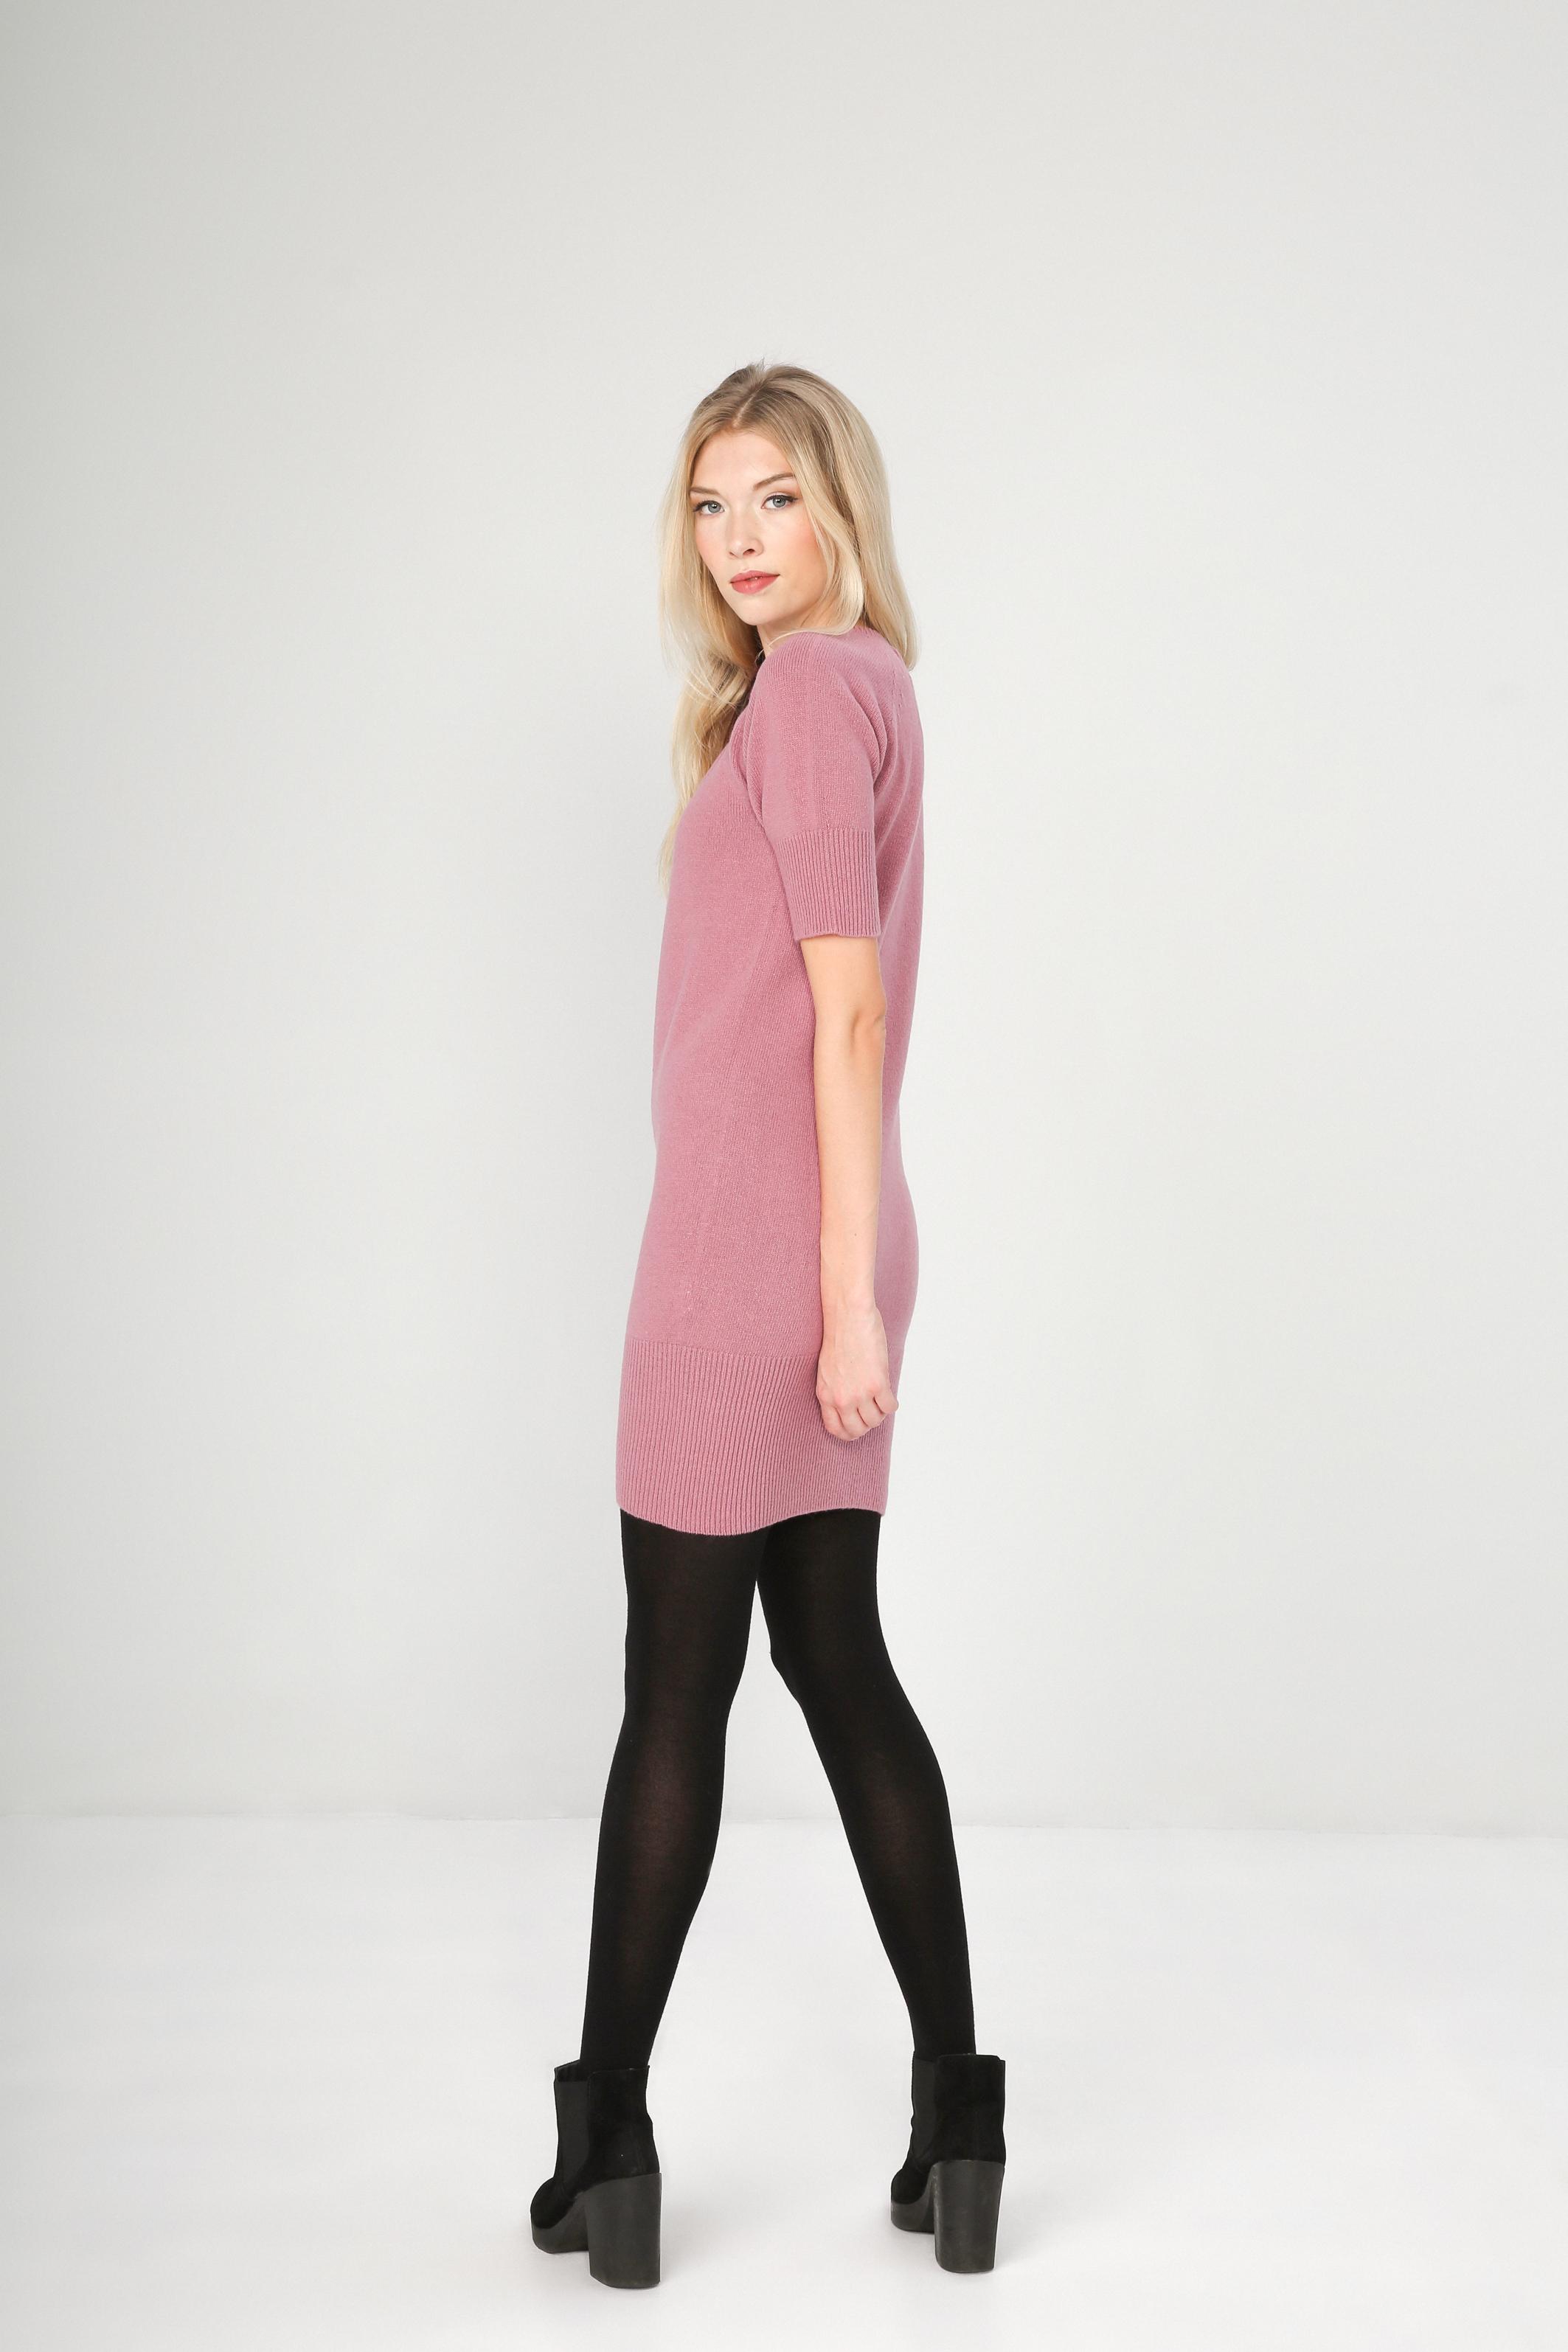 Robes  Fontana 2.0 GISELLA pink